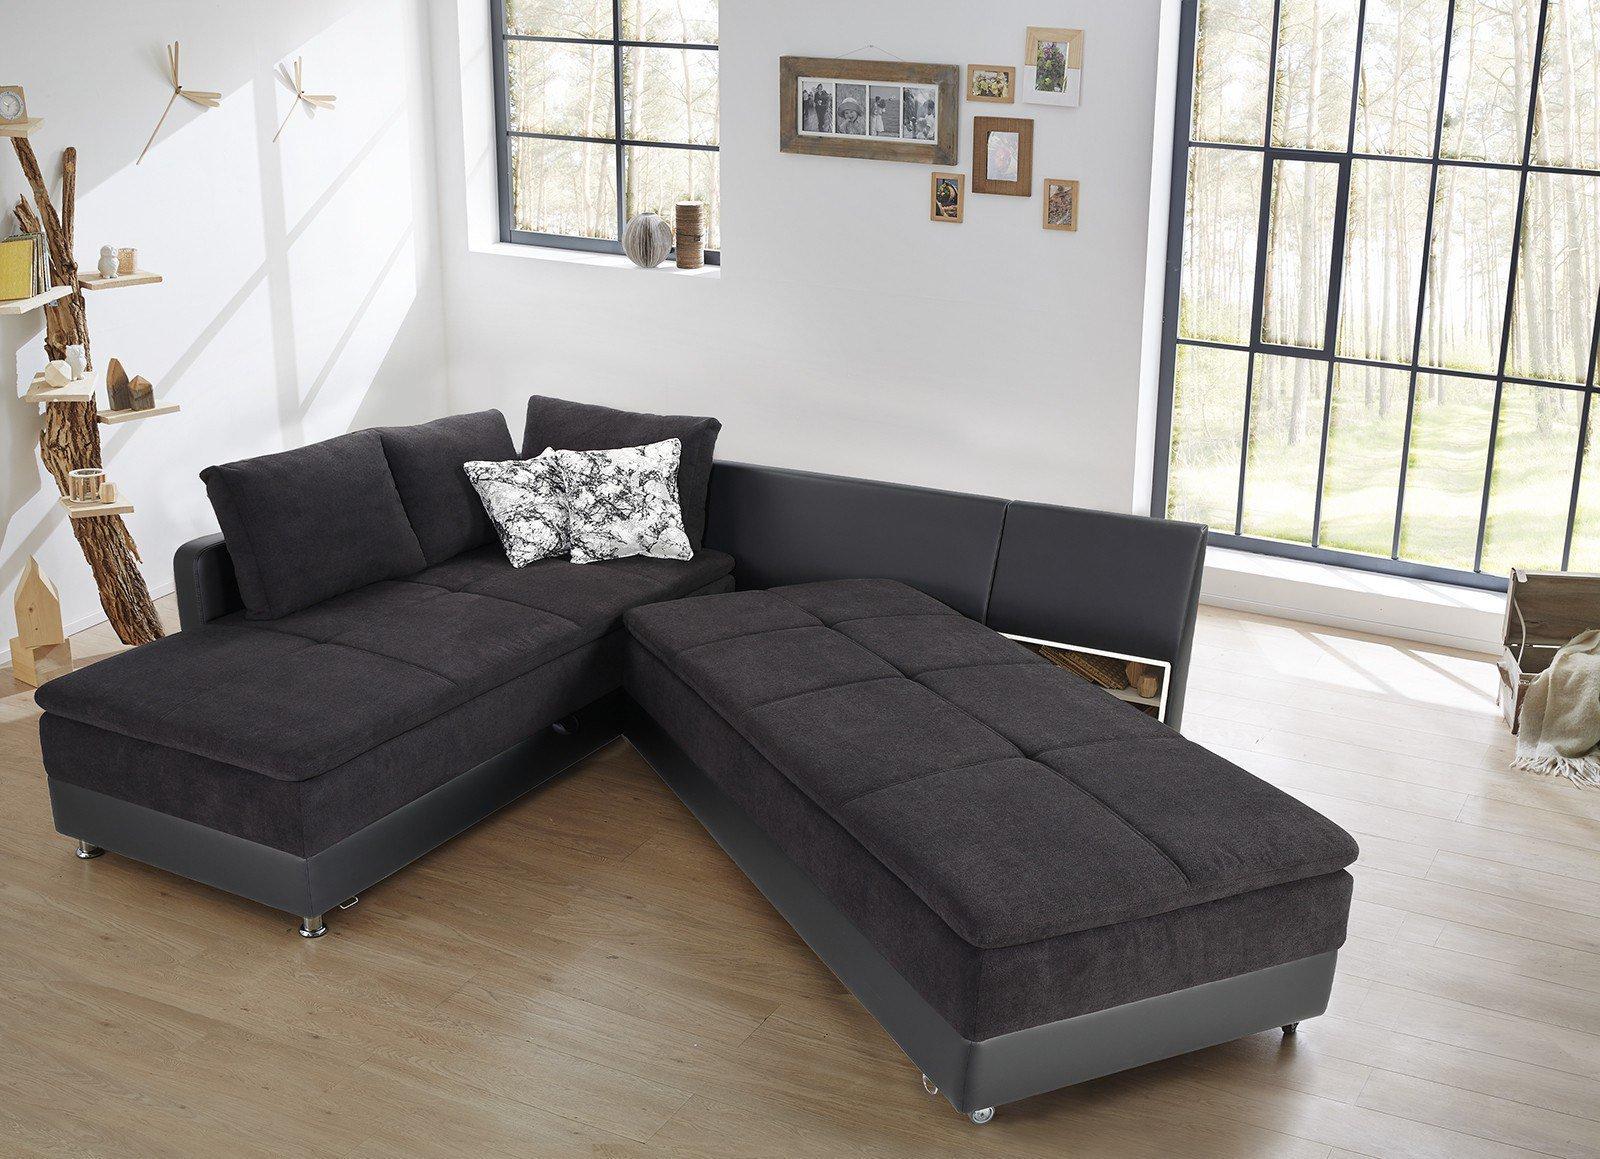 jockenh fer modena eckgarnitur in schwarz m bel letz ihr online shop. Black Bedroom Furniture Sets. Home Design Ideas